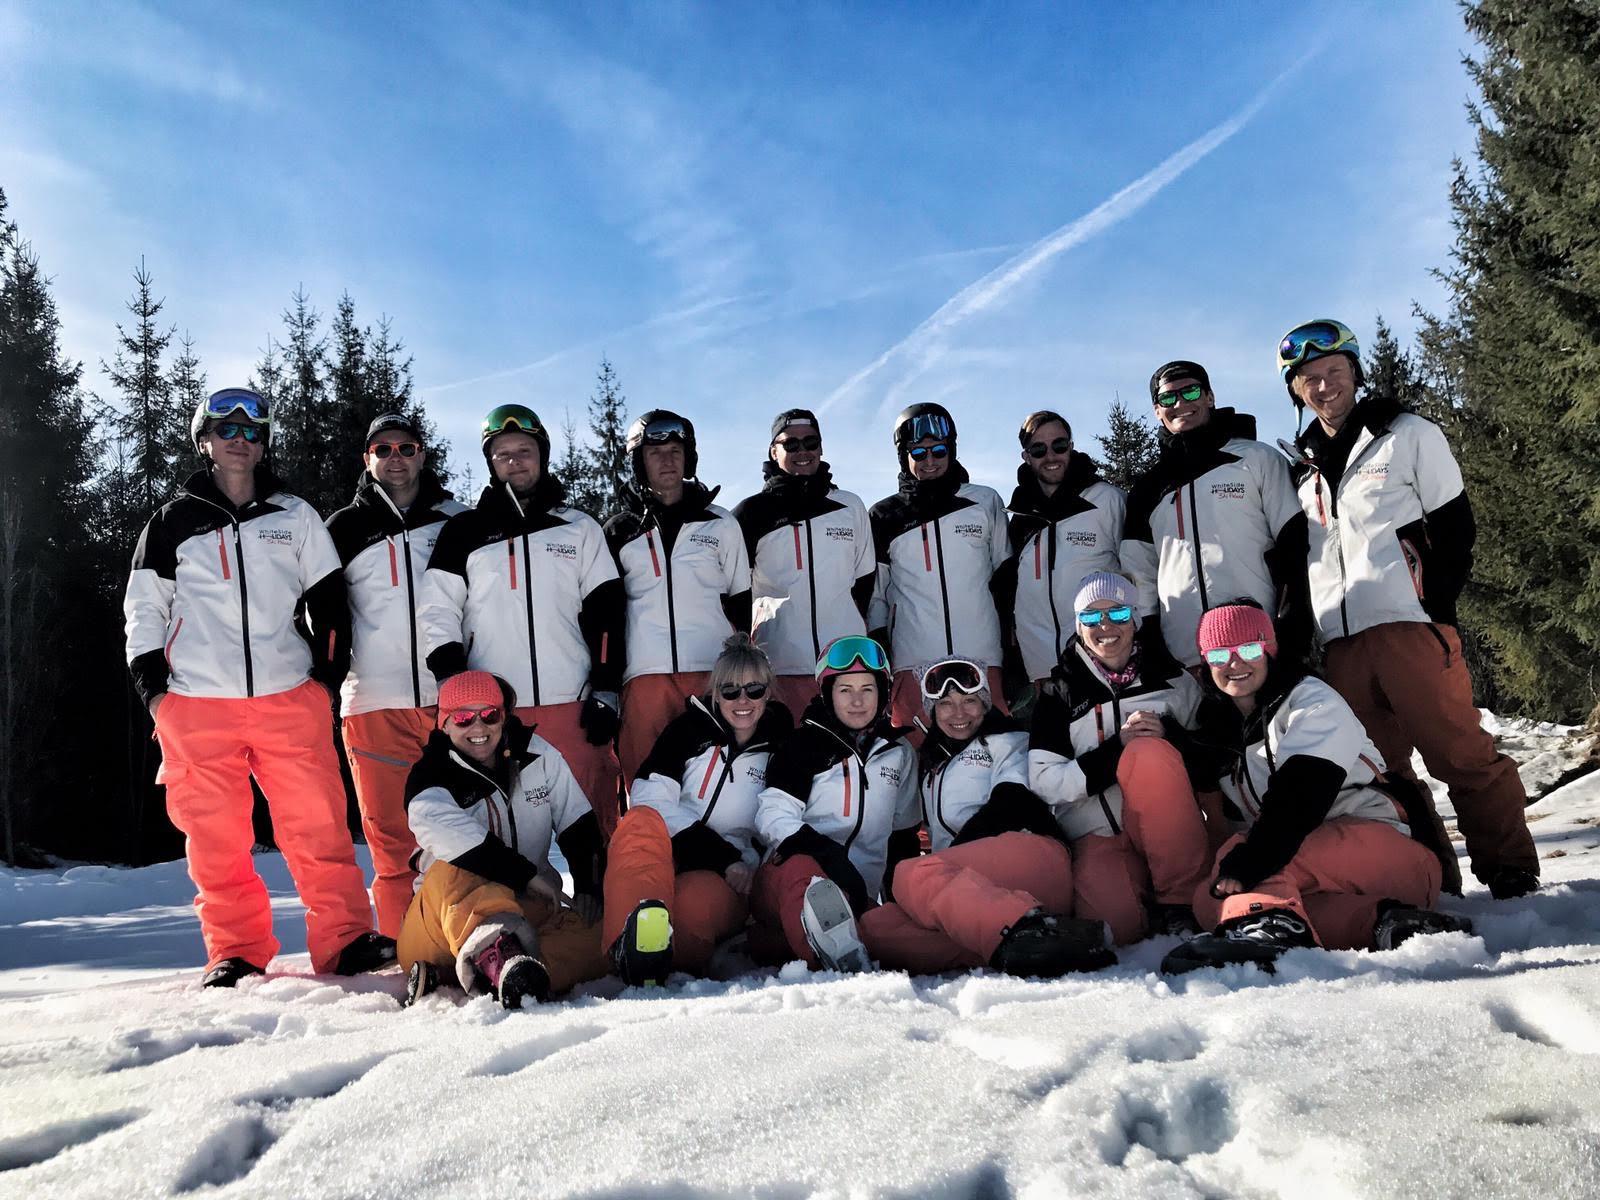 White Side Holidays Poland, Ski and Snowboard Instructors celebrating 10 years in Zakopane in 2019